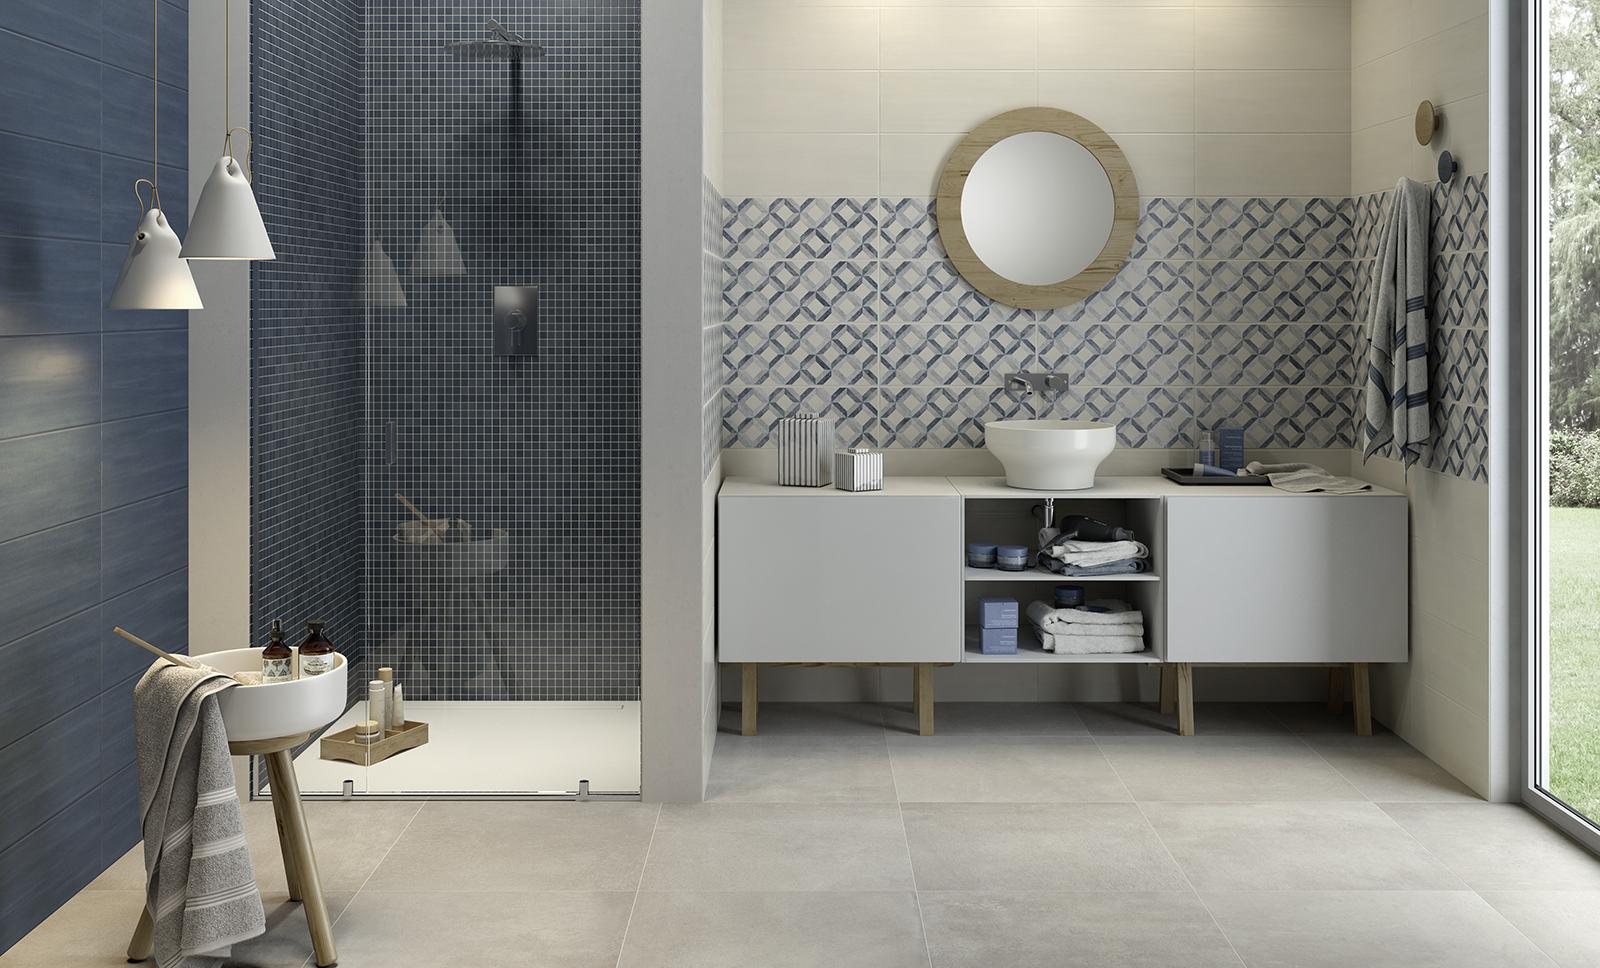 Bianco Denver Salle De Bain ~ travertino grigio porcelain tile travertino 12×24 and 17×17 kyra